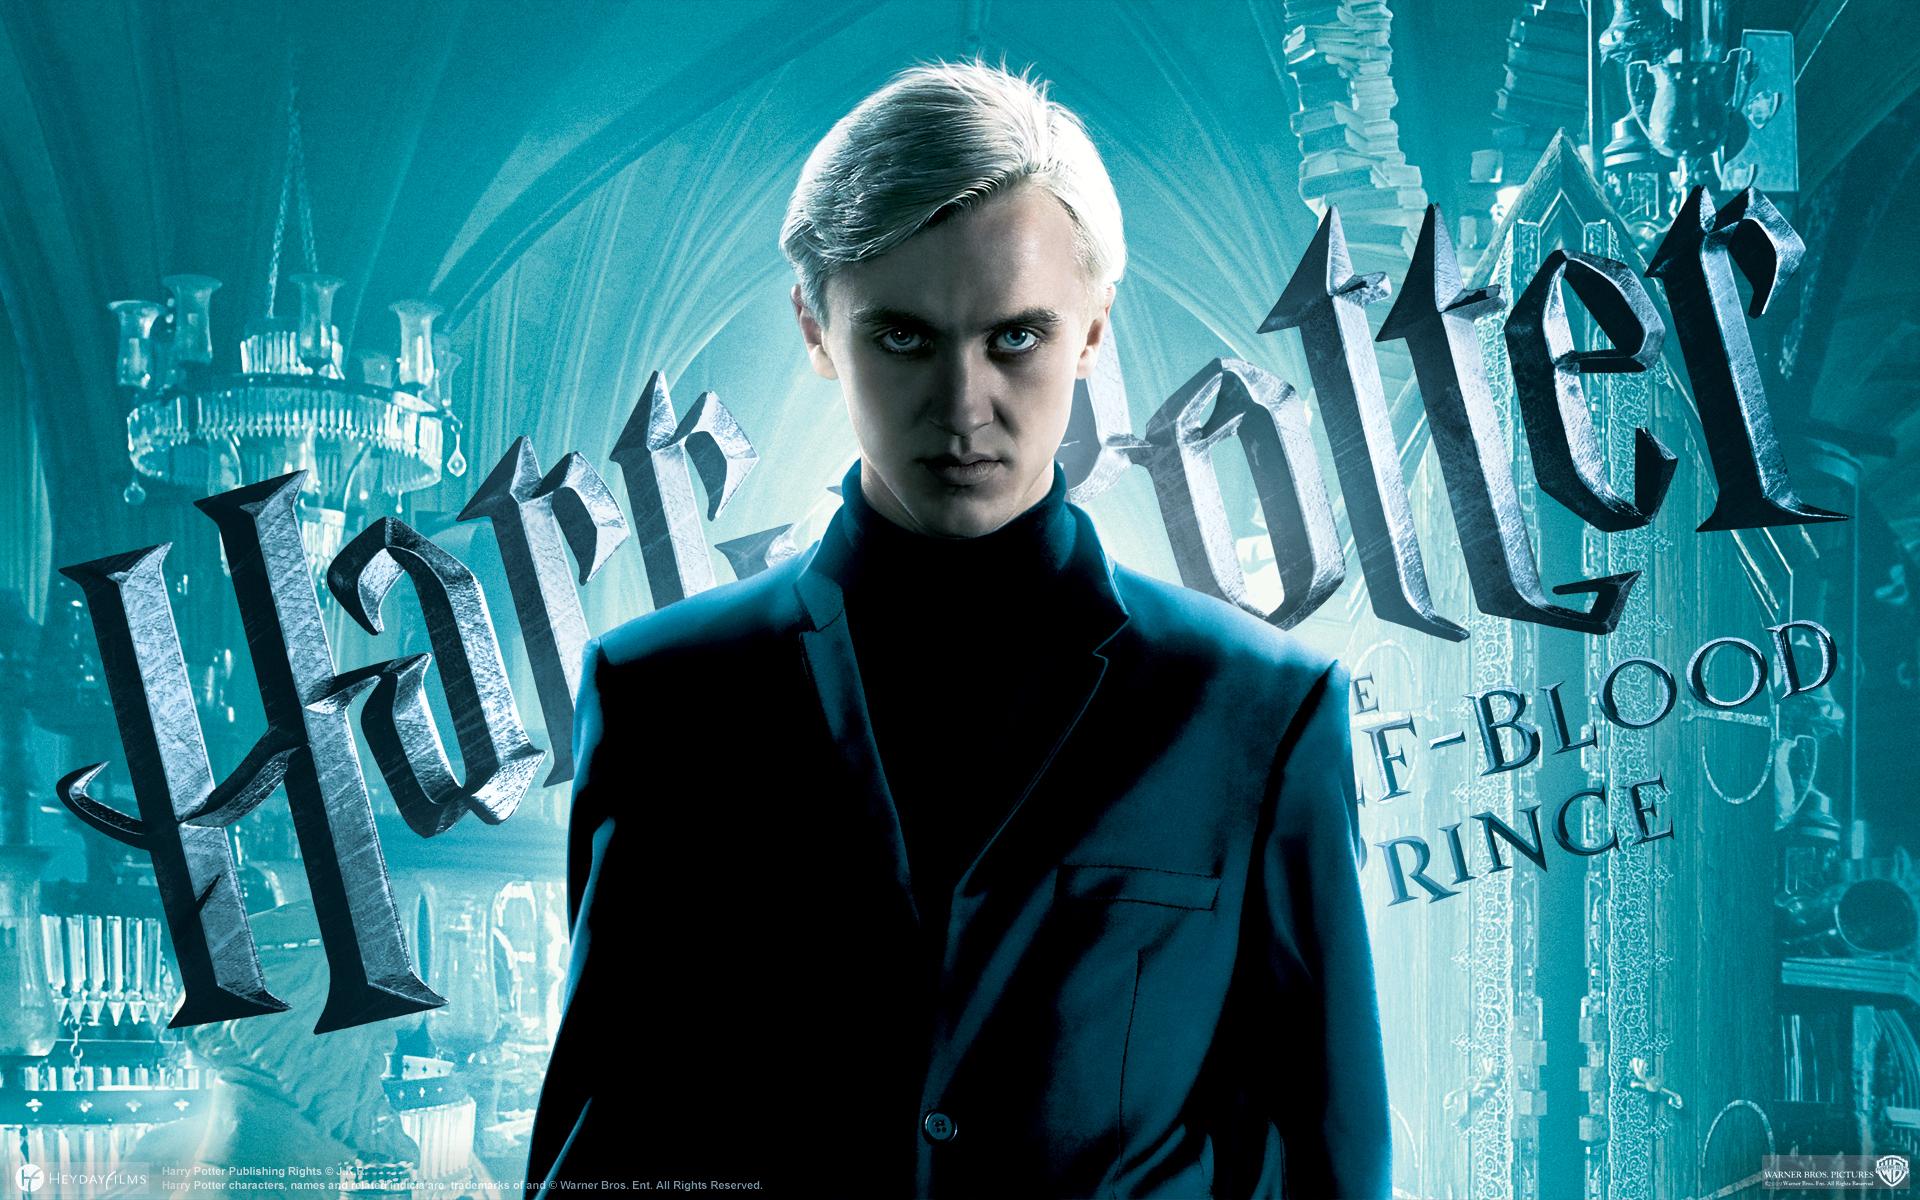 Half Blood Prince Draco Malfoy 1400370 Hd Wallpaper